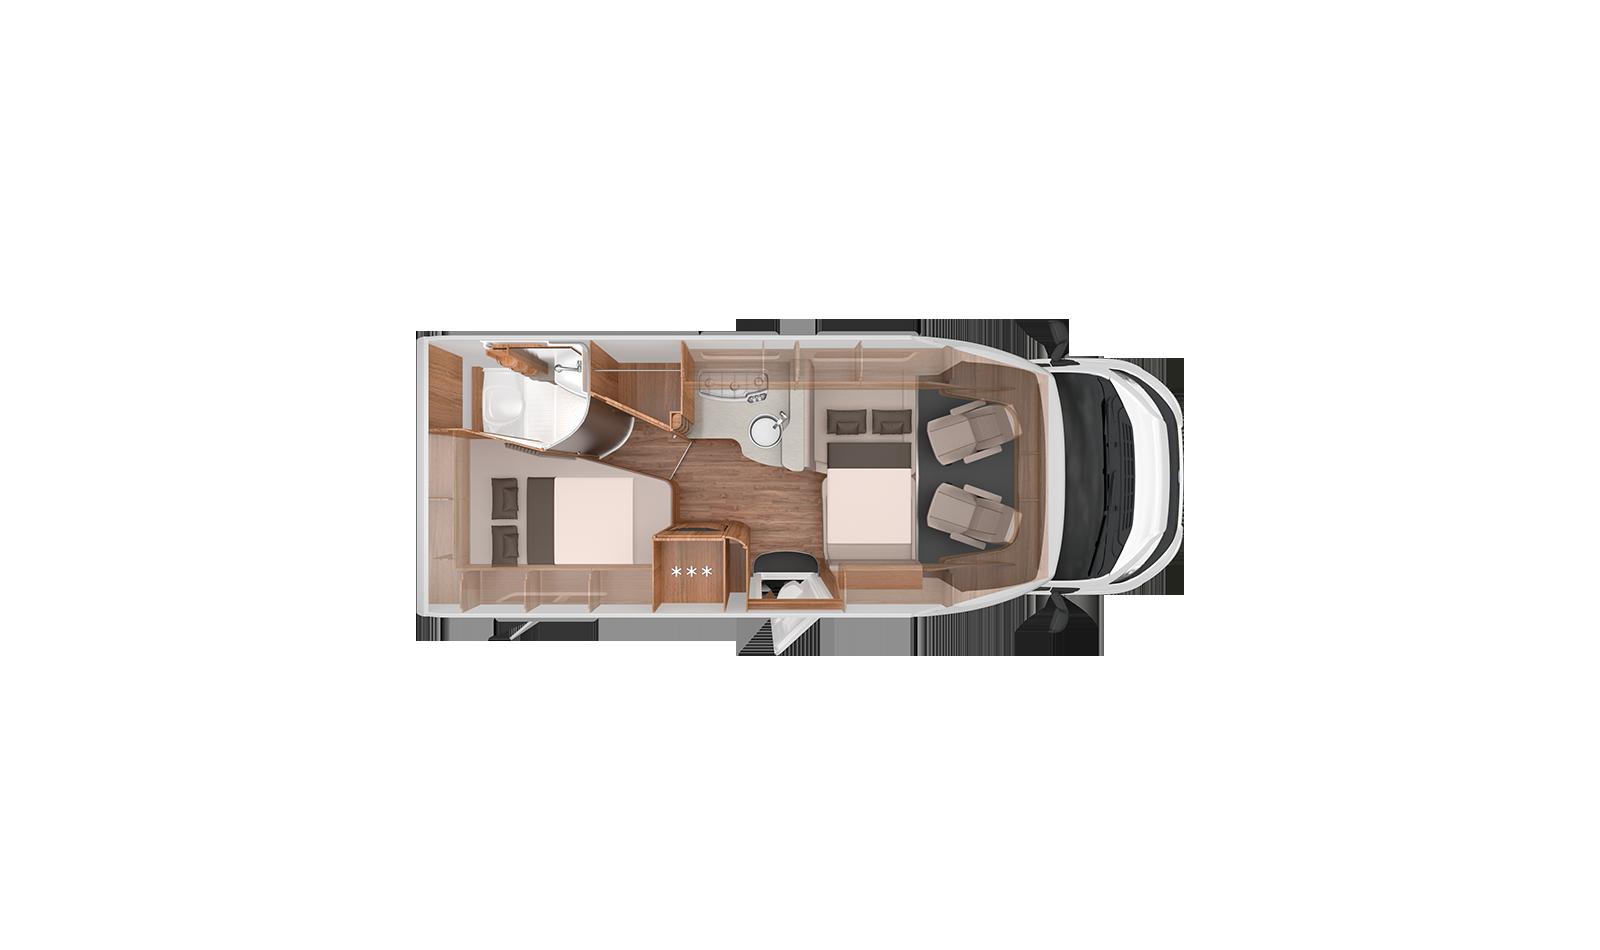 KNAUS SUN TI 650 MF | Serienausstattung